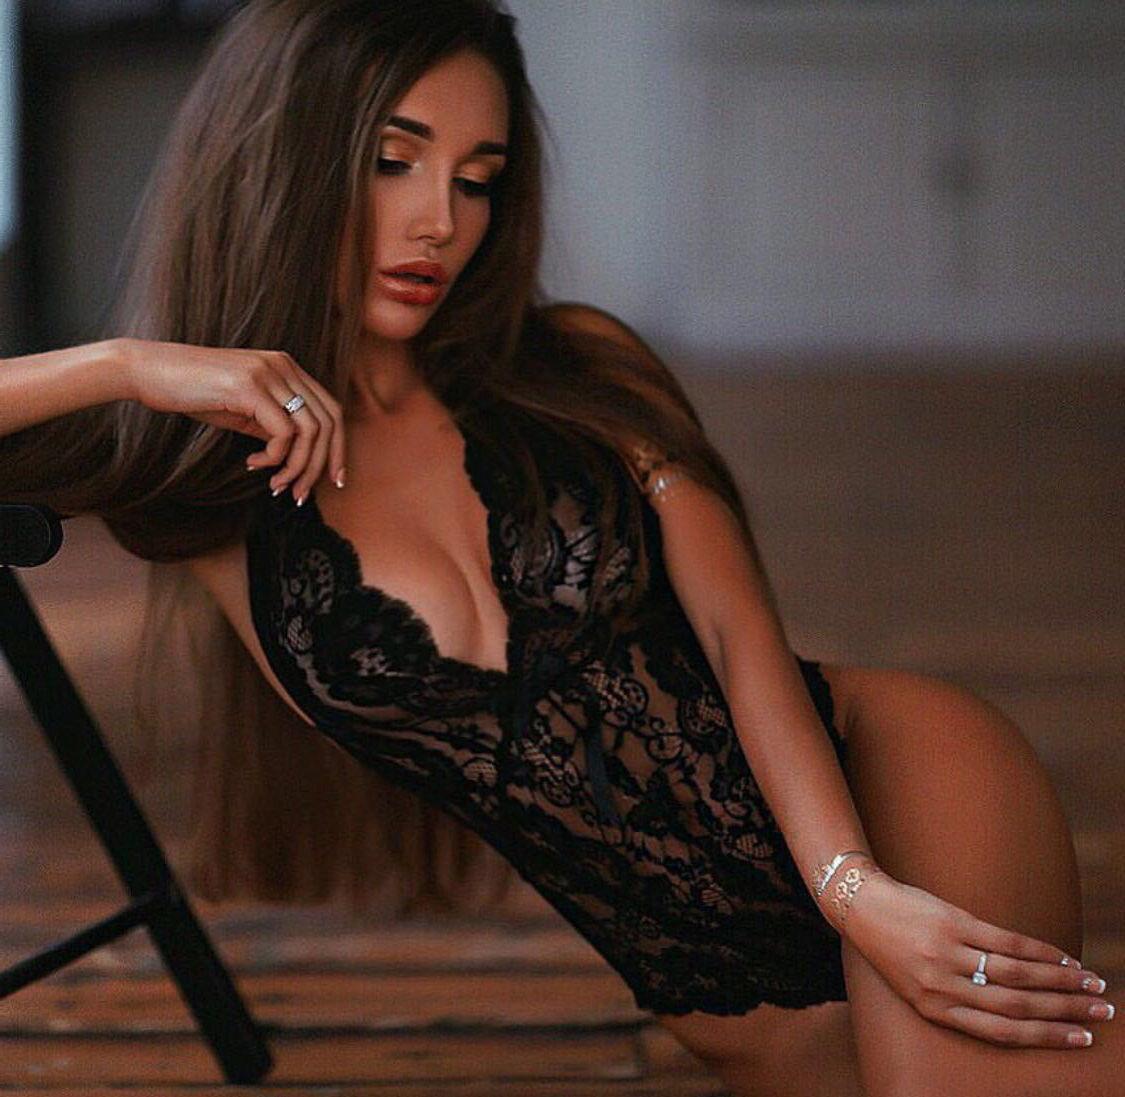 SEXY STRIPTEASE SEKSITREFFI